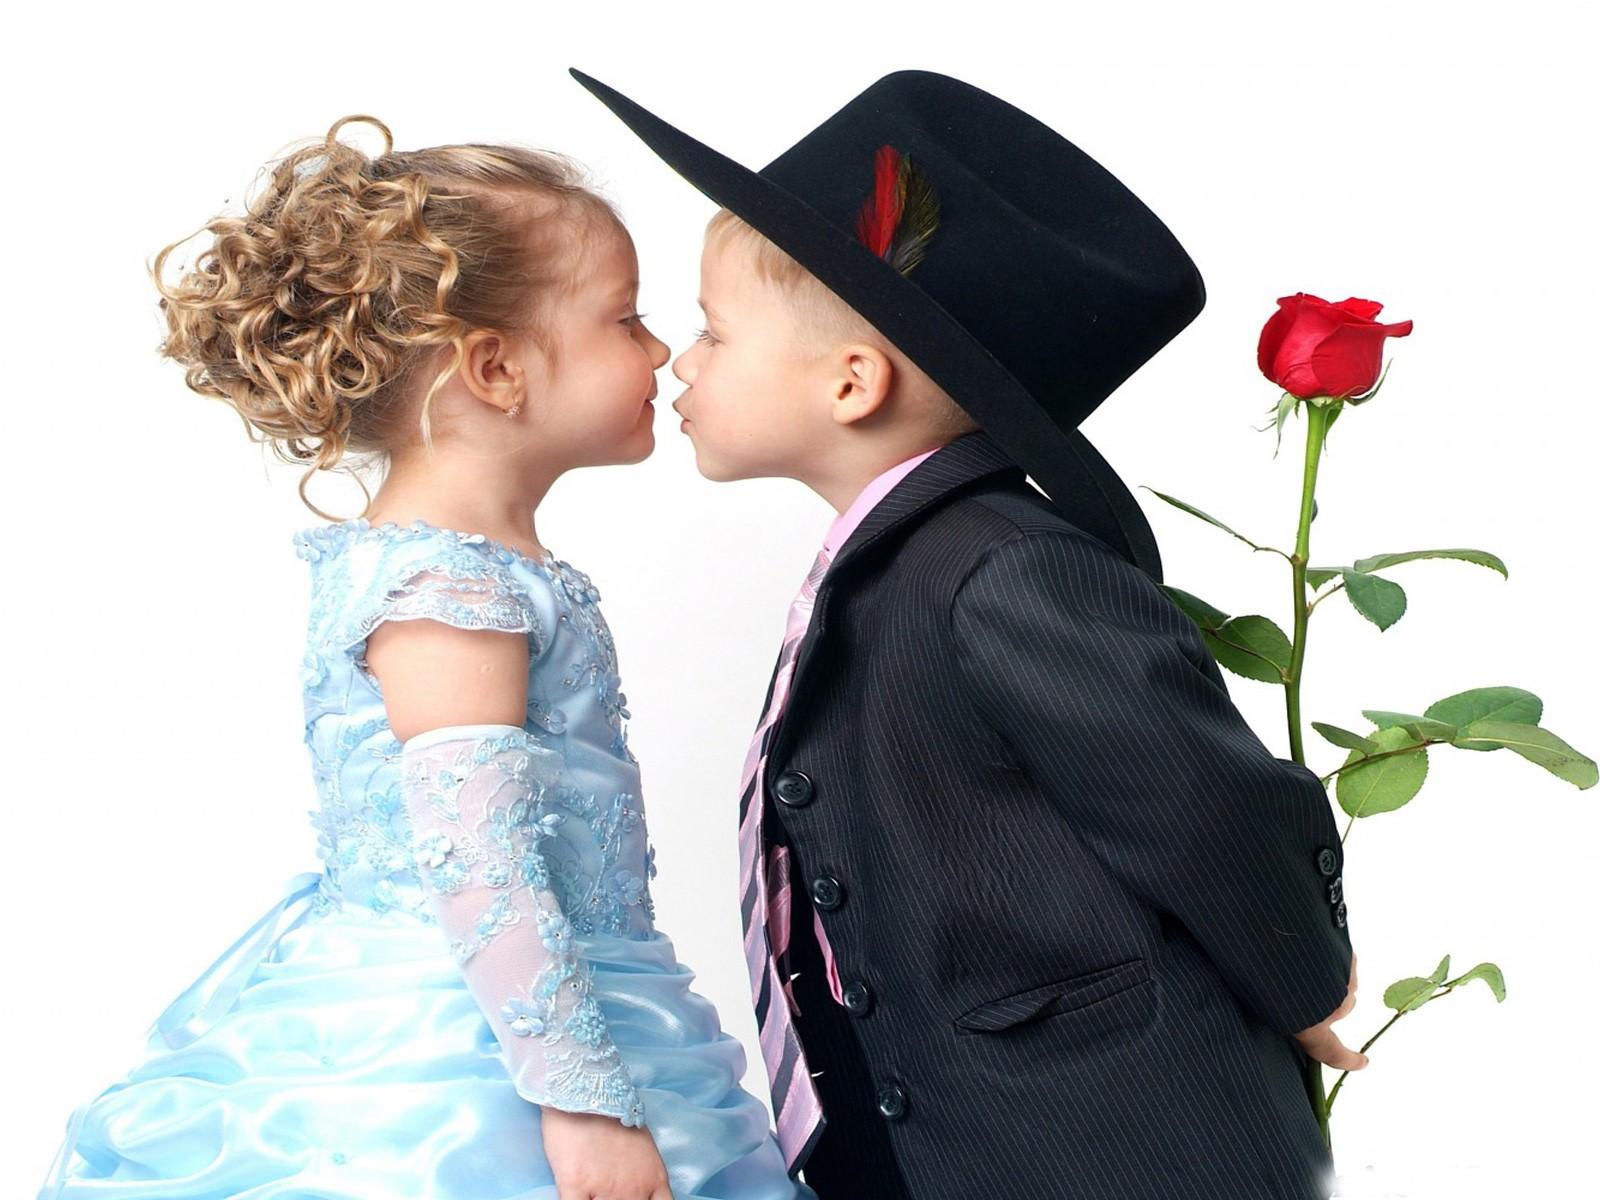 Romantic Couple Kiss Hd Wallpapers